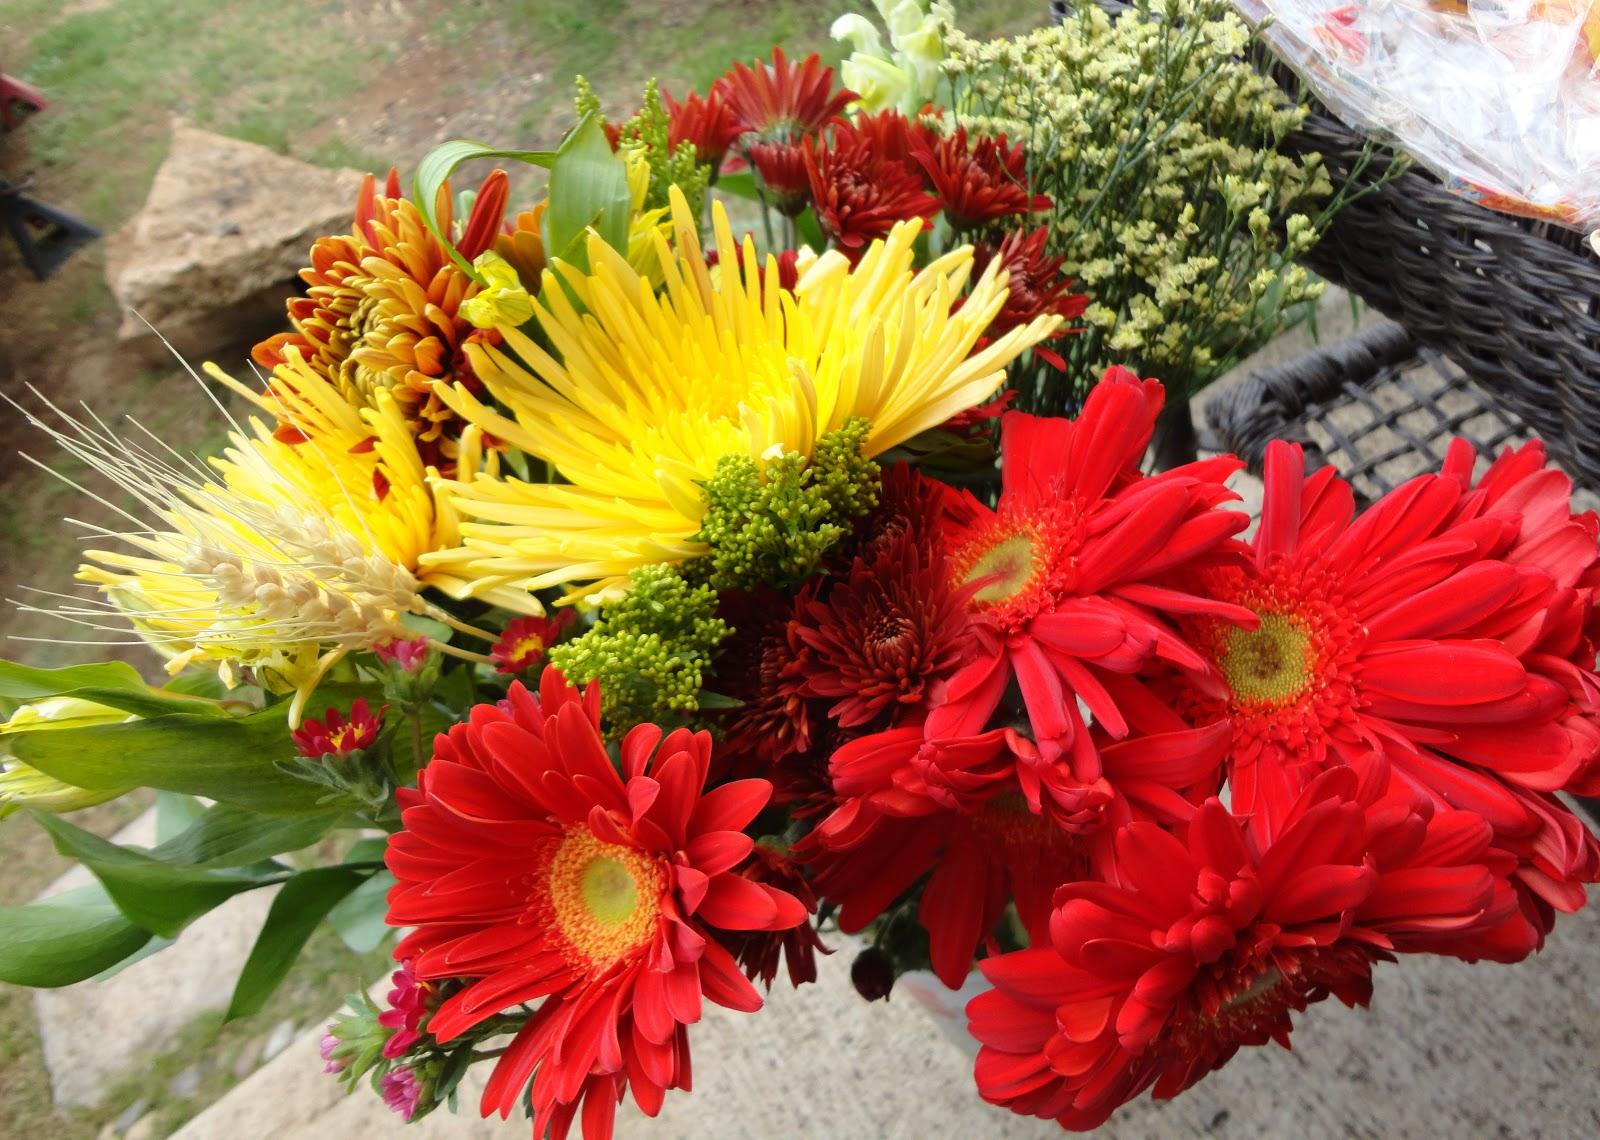 isshou no yakusoku Floral Arranging III Thanksgiving DIY Centerpiece